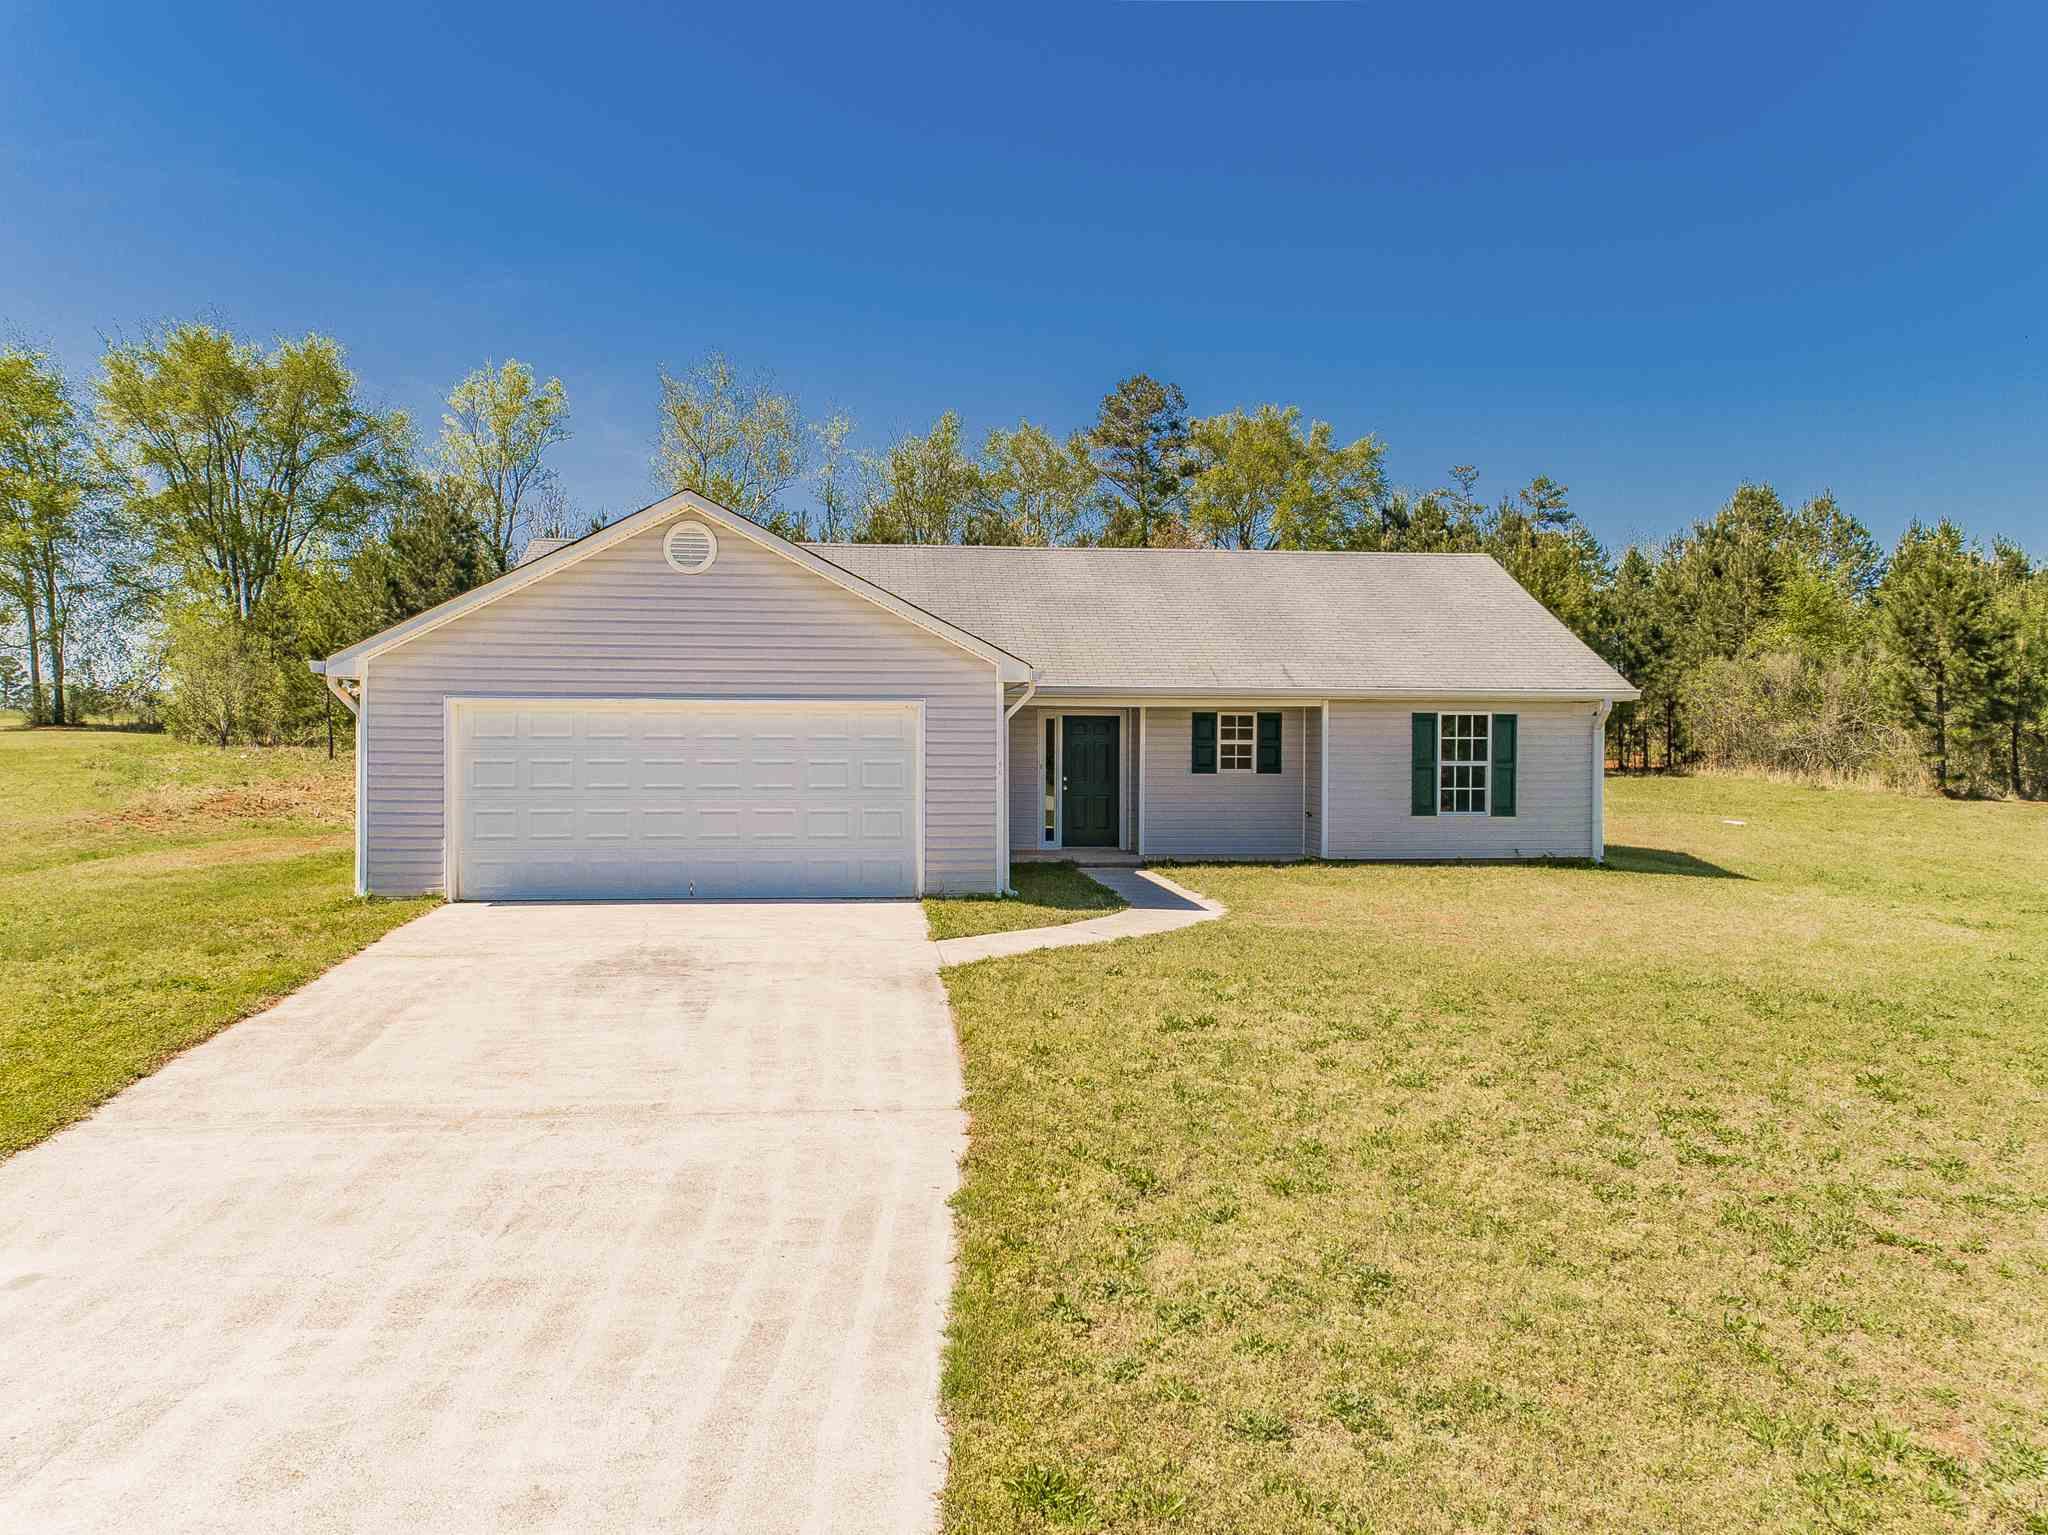 150 OCONEE MEADOWS WAY, Lake Oconee in Putnam County, GA 31024 Home for Sale